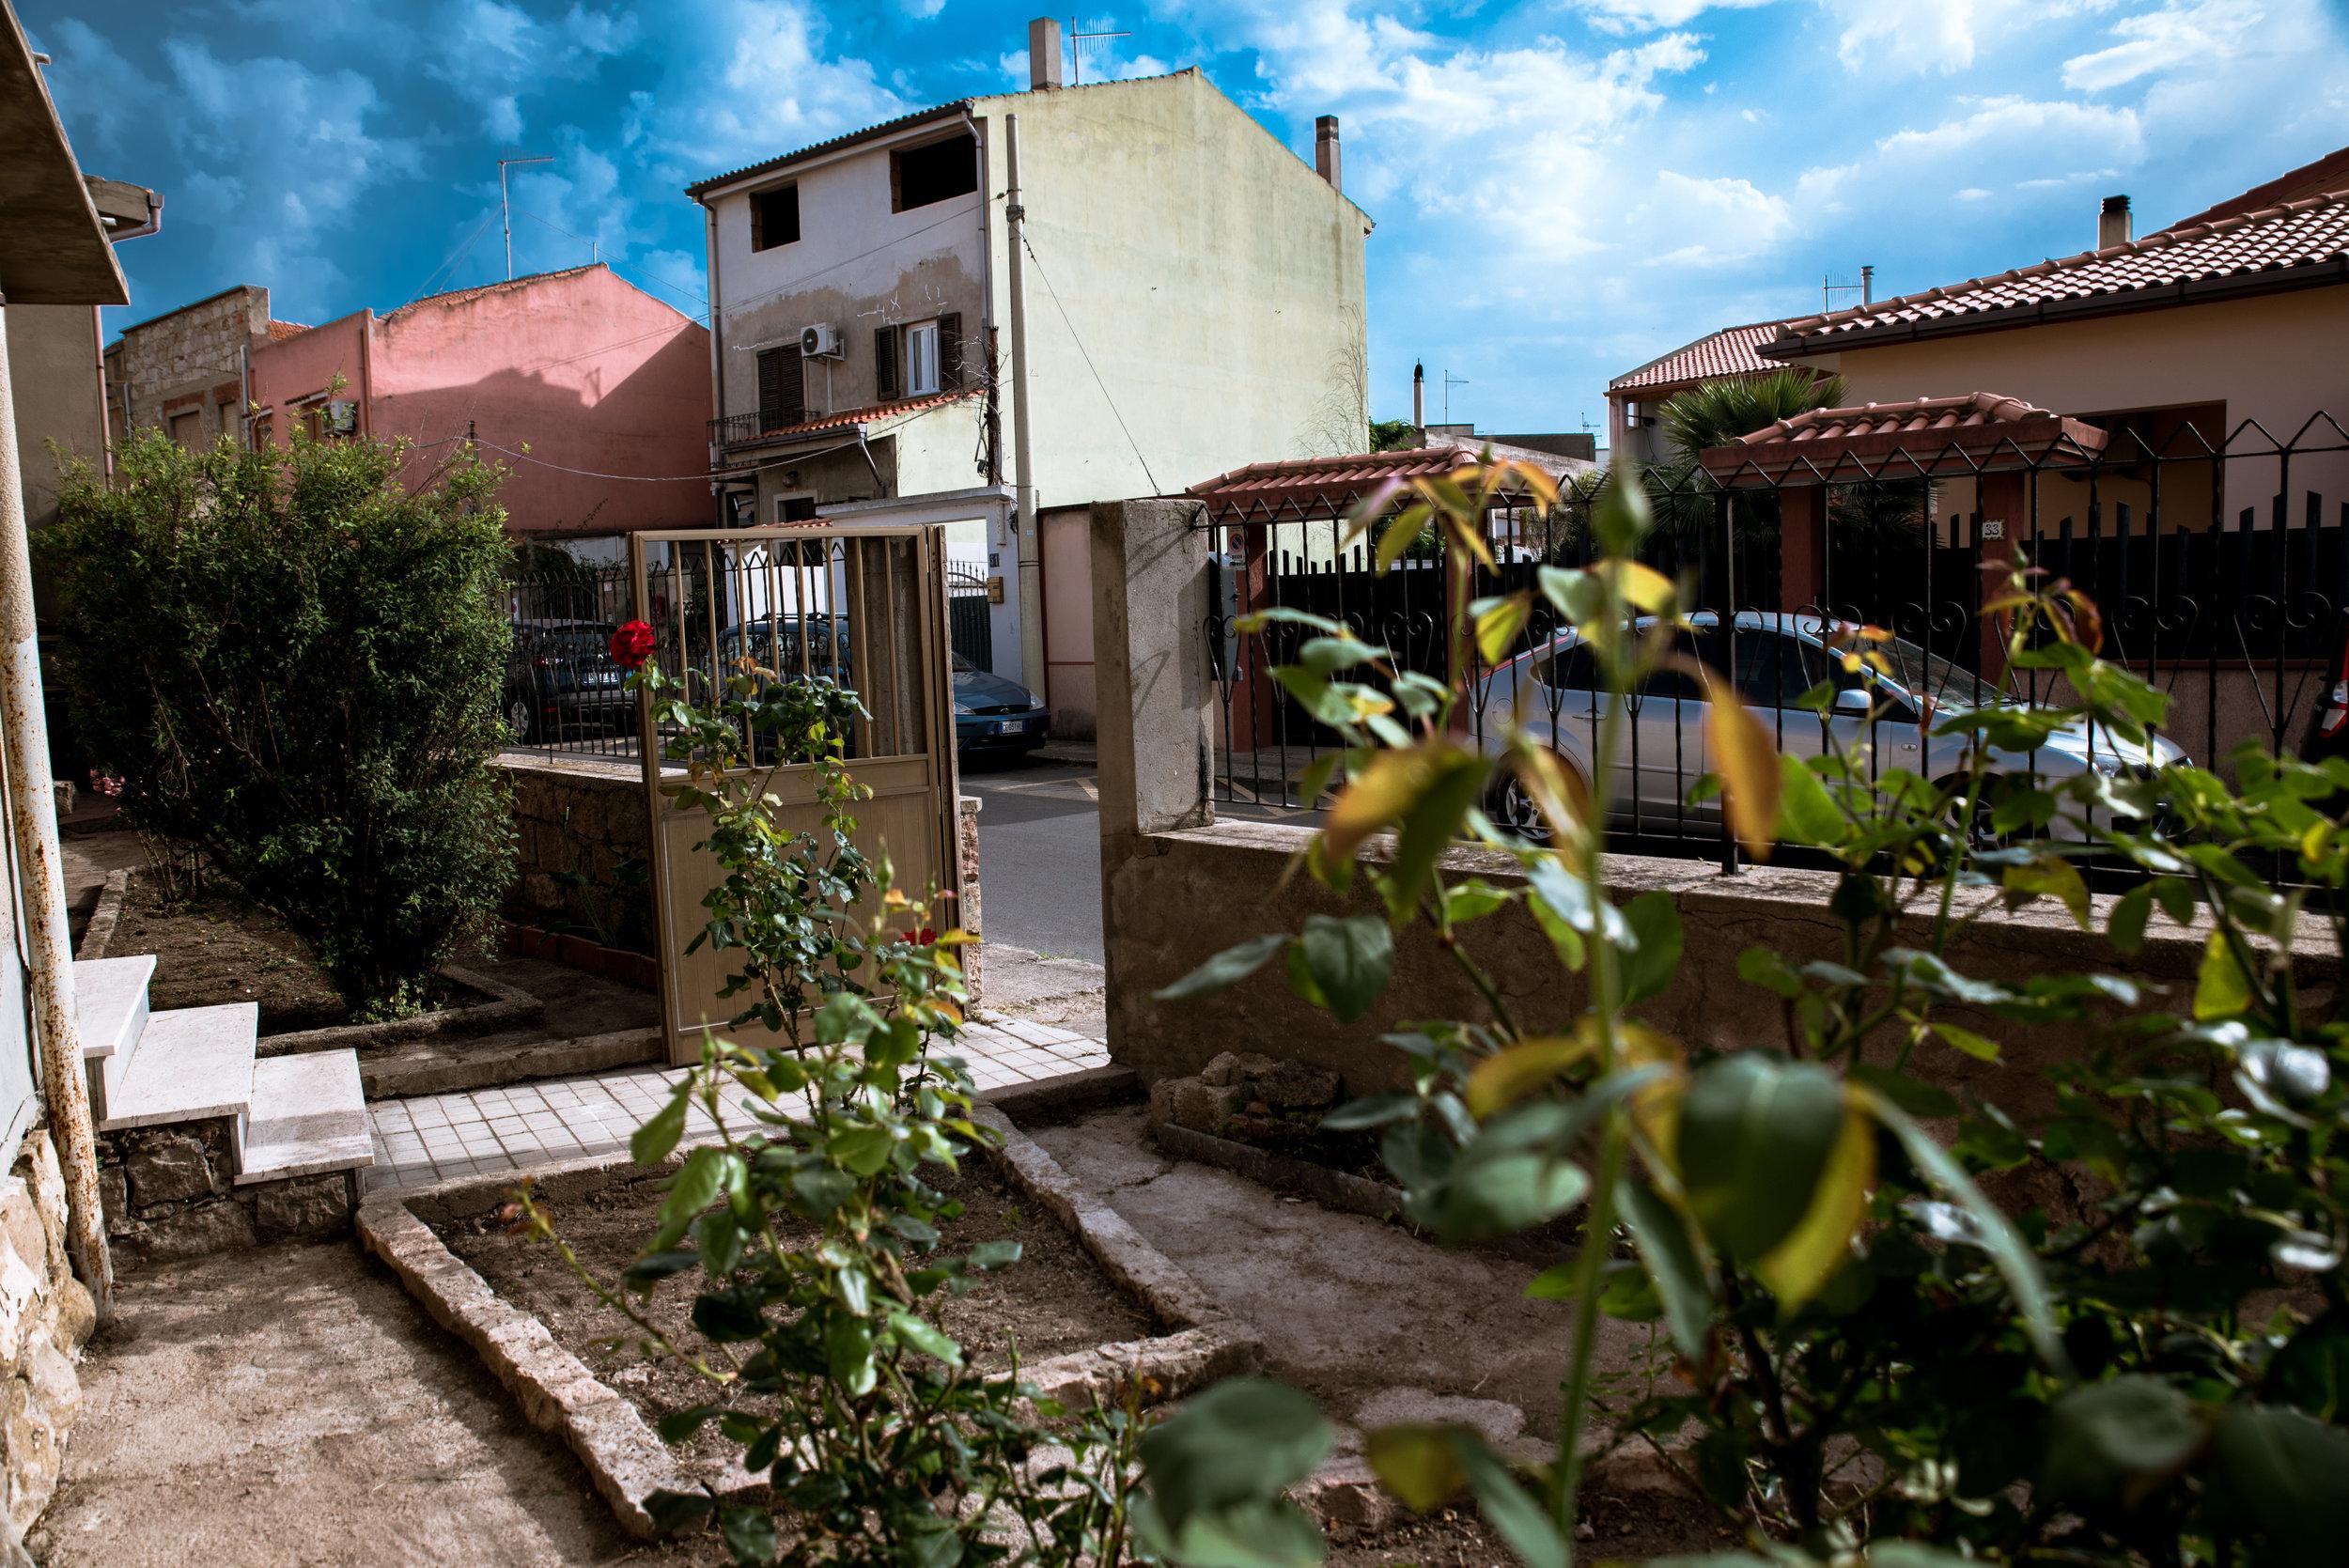 www.prfotostudio.com-S.A-1-41.JPG